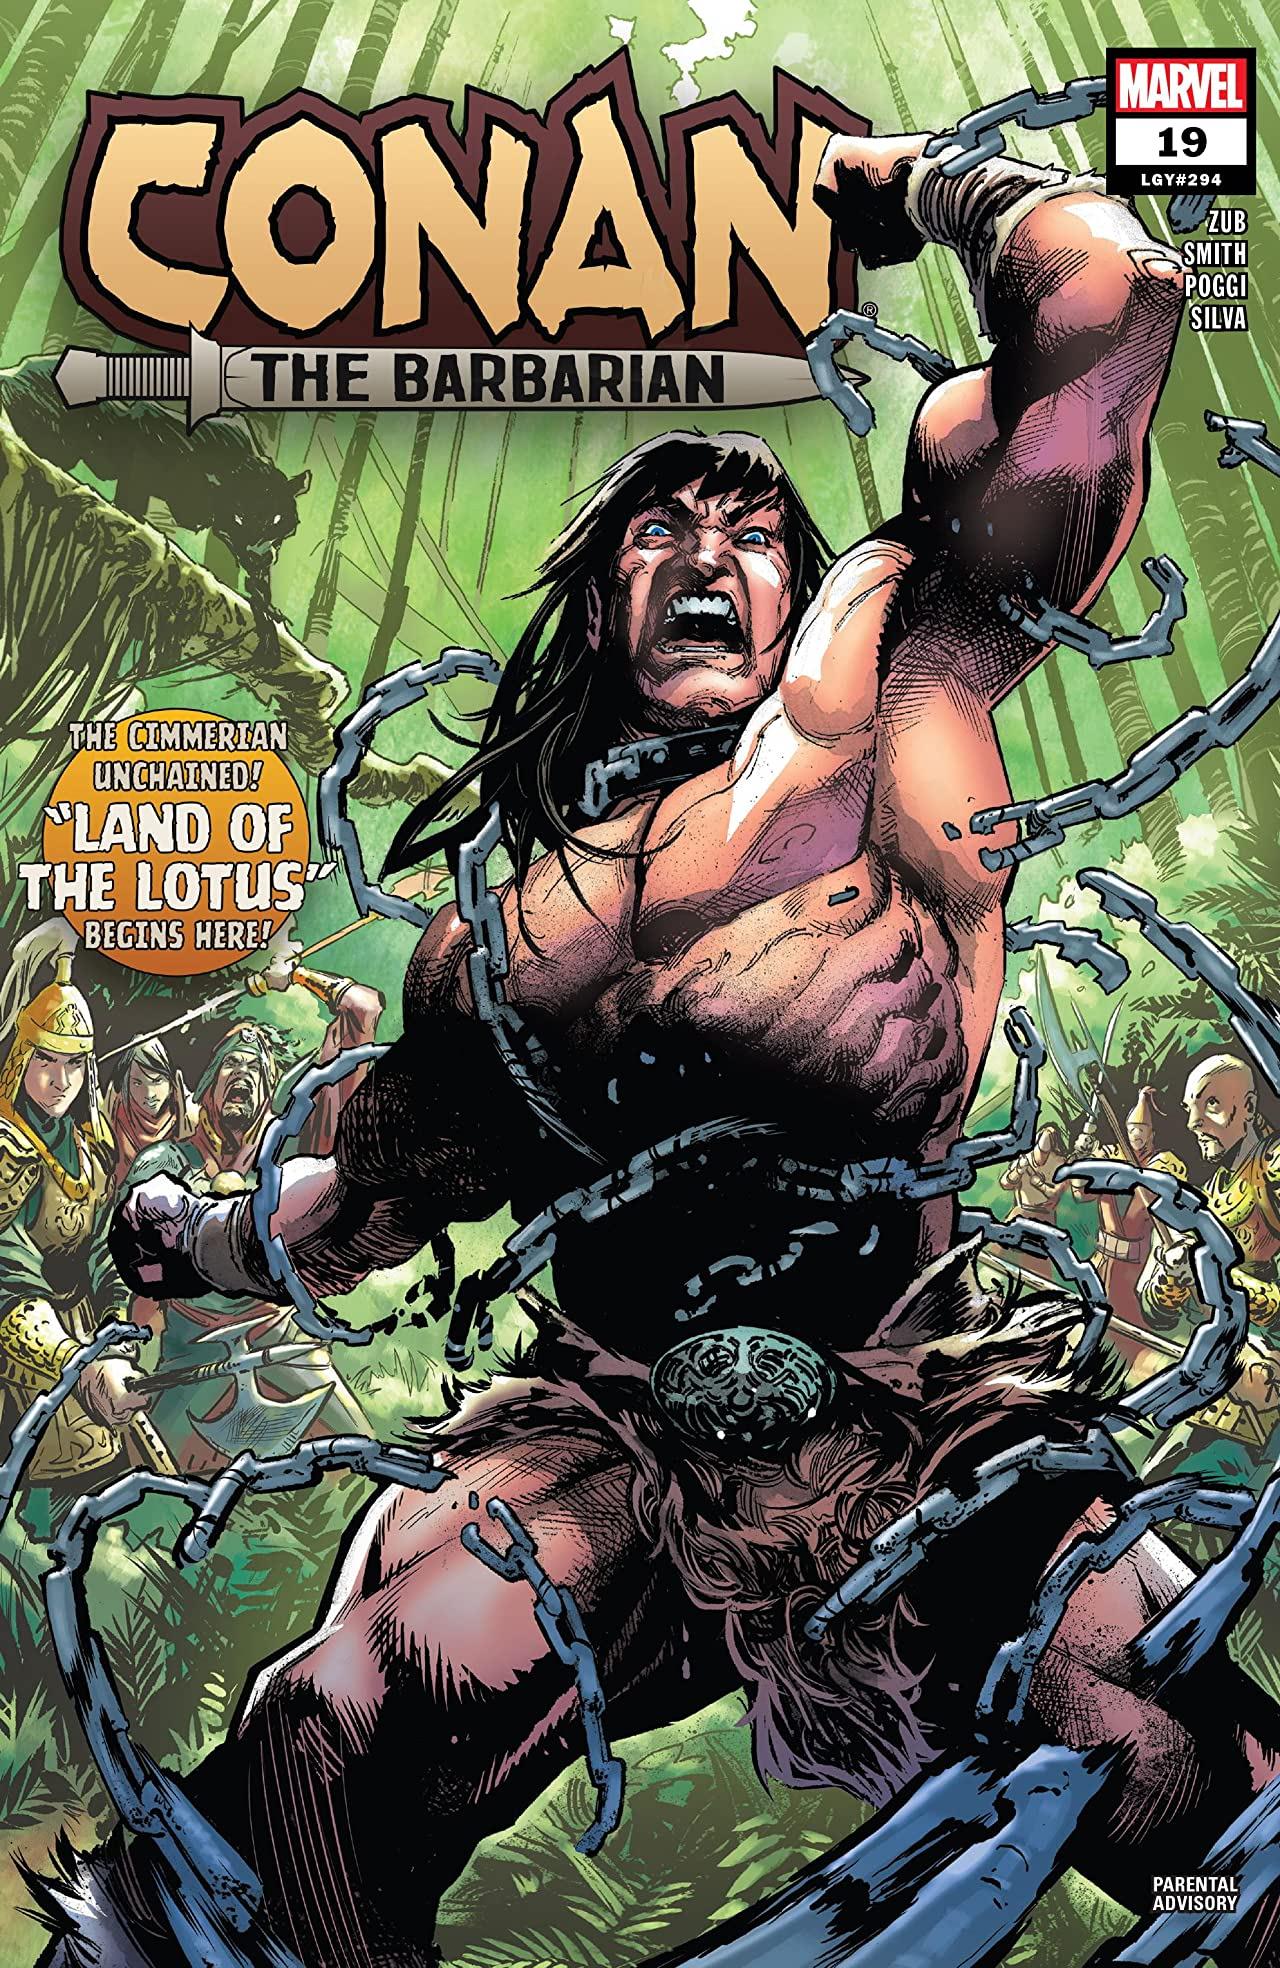 Conan the Barbarian (2019) #19